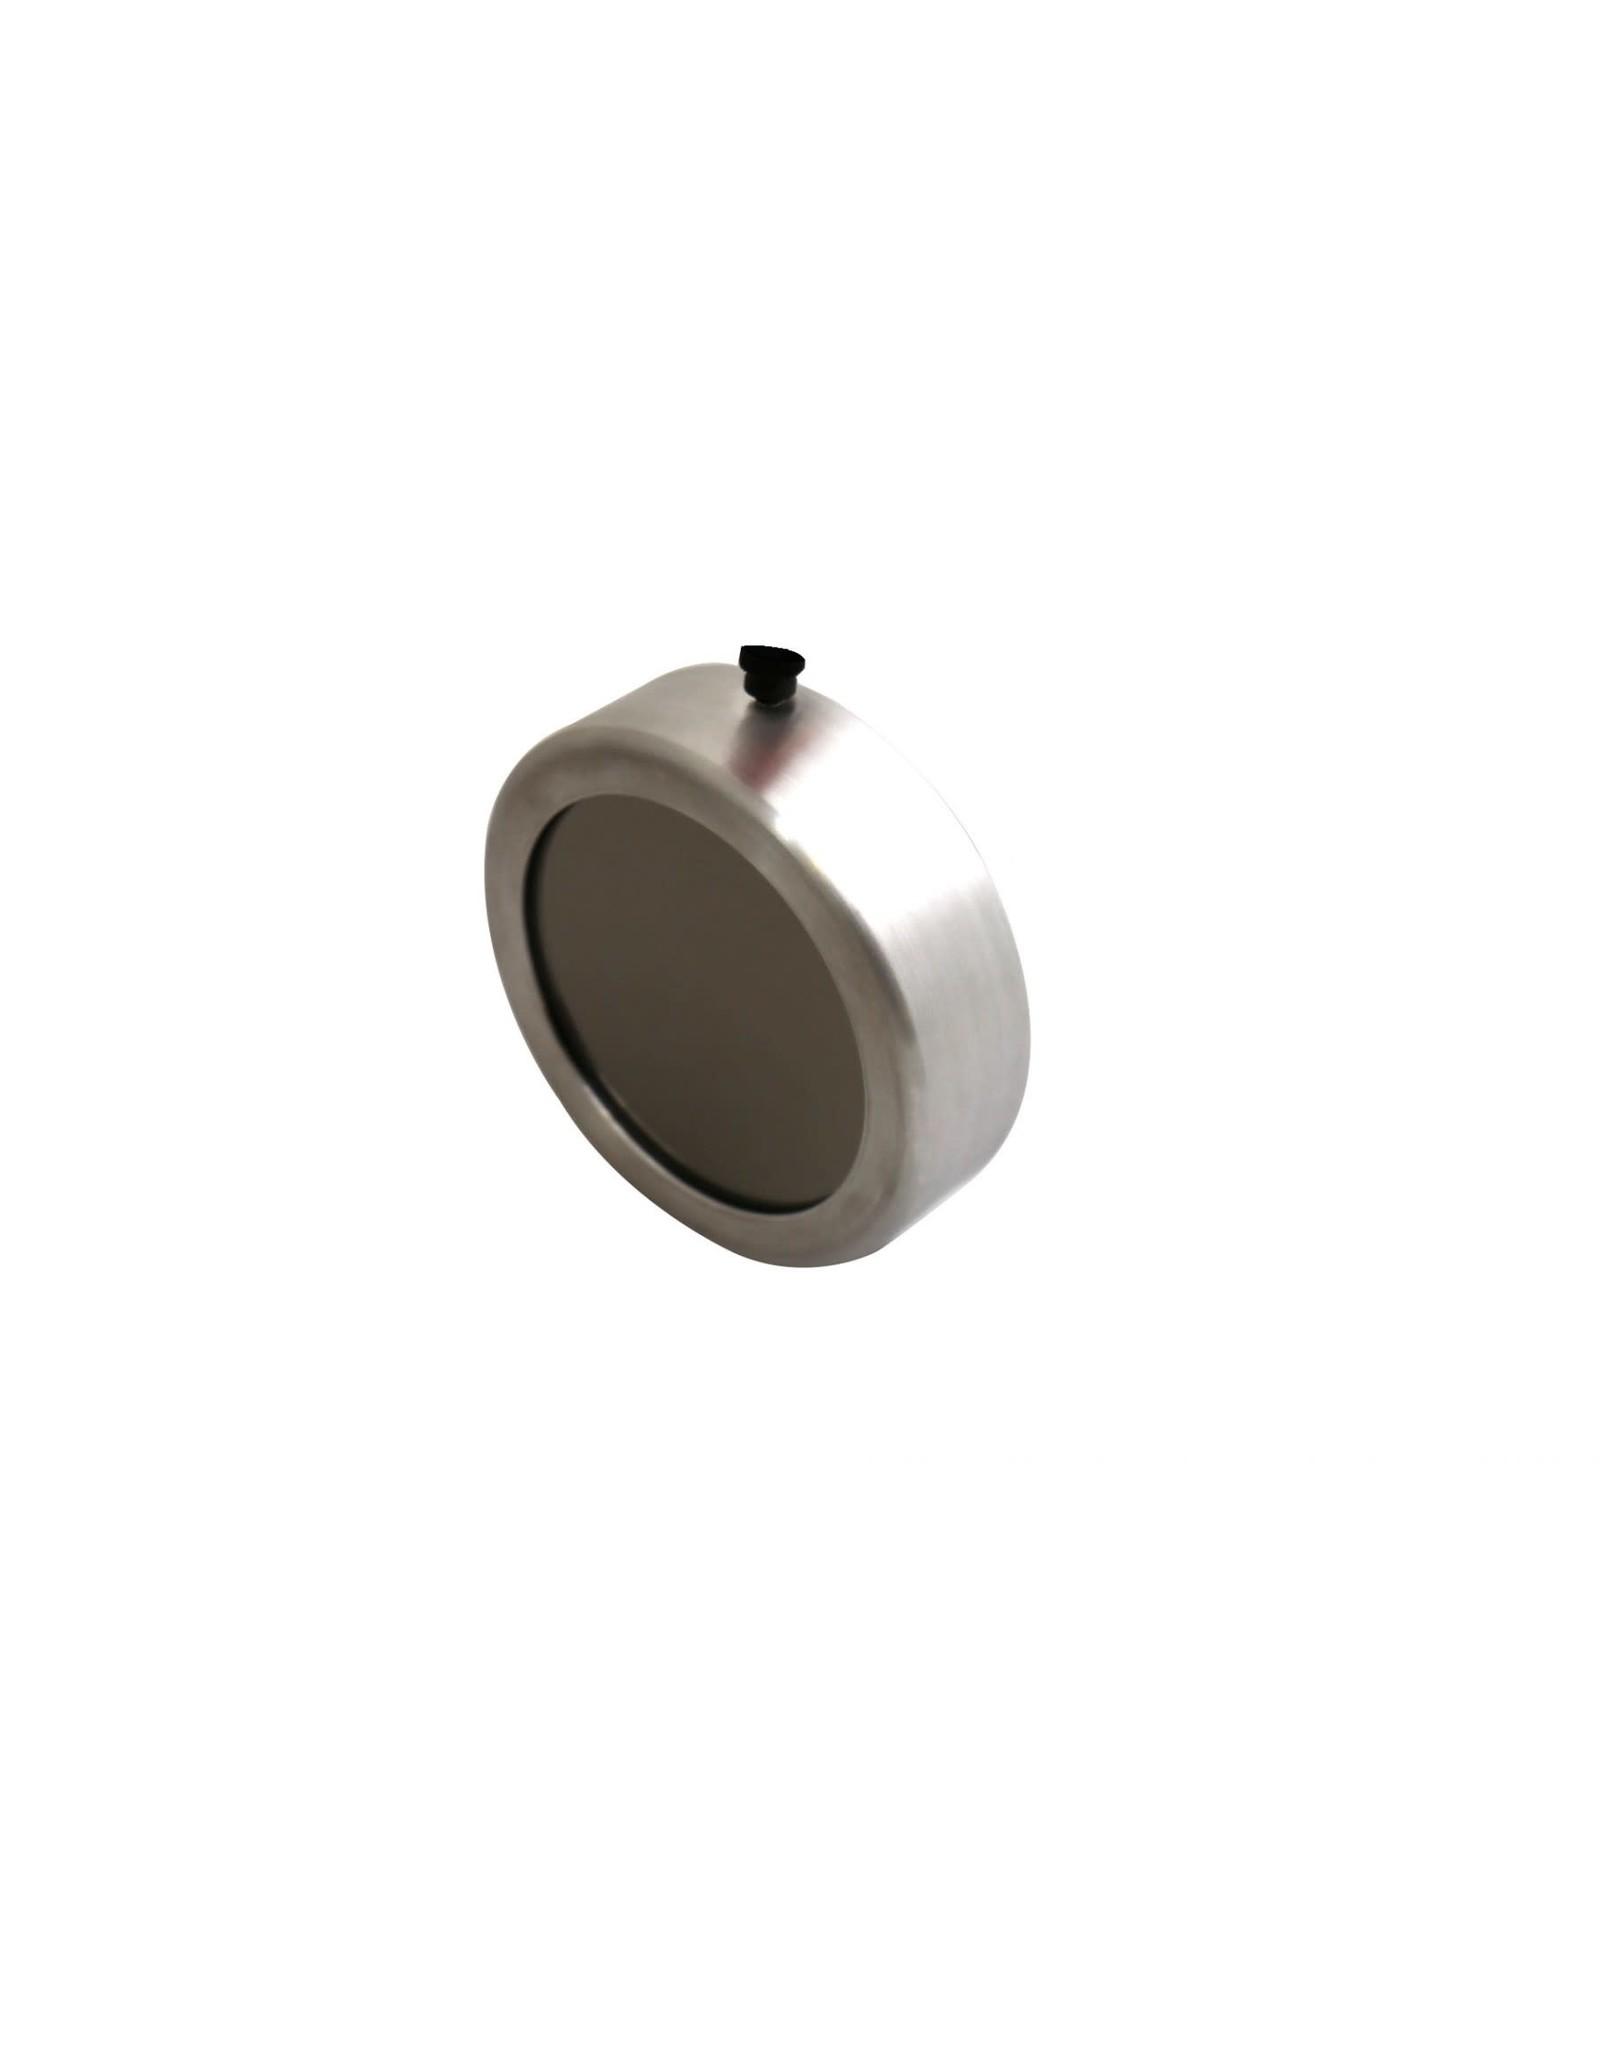 Meade Meade Glass White-Light Solar Filter #450 (ID 114mm)